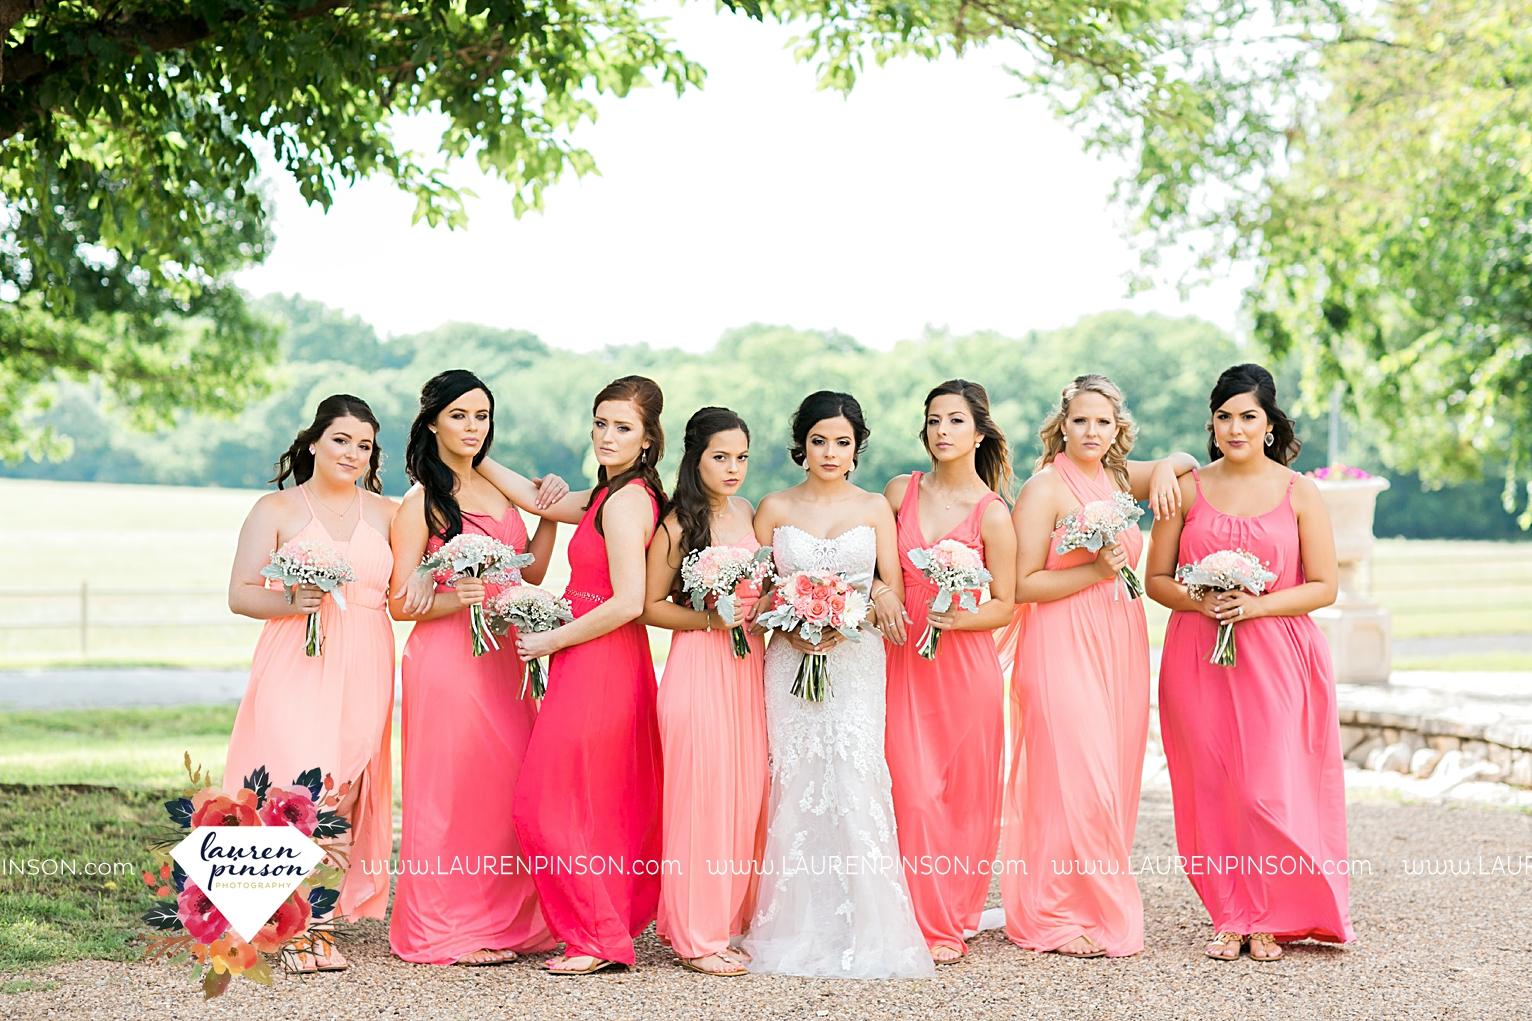 wichita-falls-wedding-nocona-comanche-rose-ranch-rustic-pink-gray-photography-00119.jpg